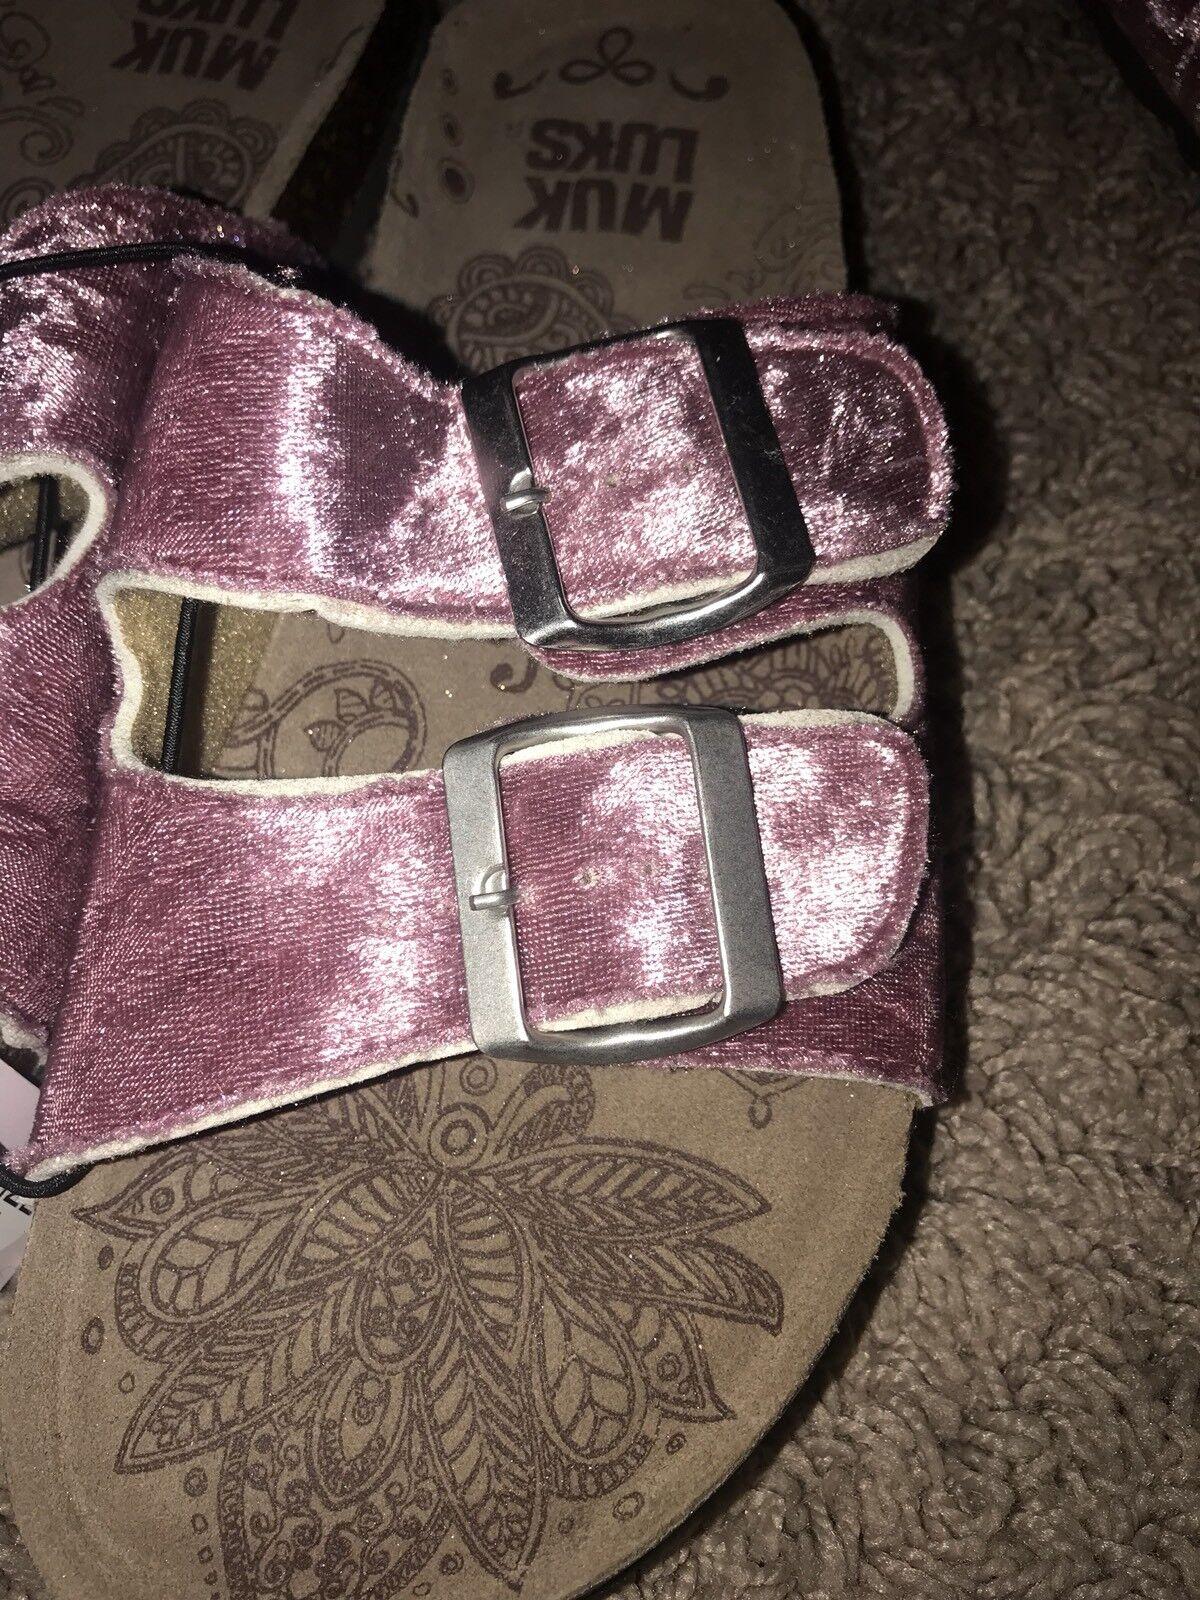 NWT Women's MukLuks Sandals Pink Velvet w/ 6,7,8,9 Memory Foam Insoles Size 6,7,8,9 w/ 46c512